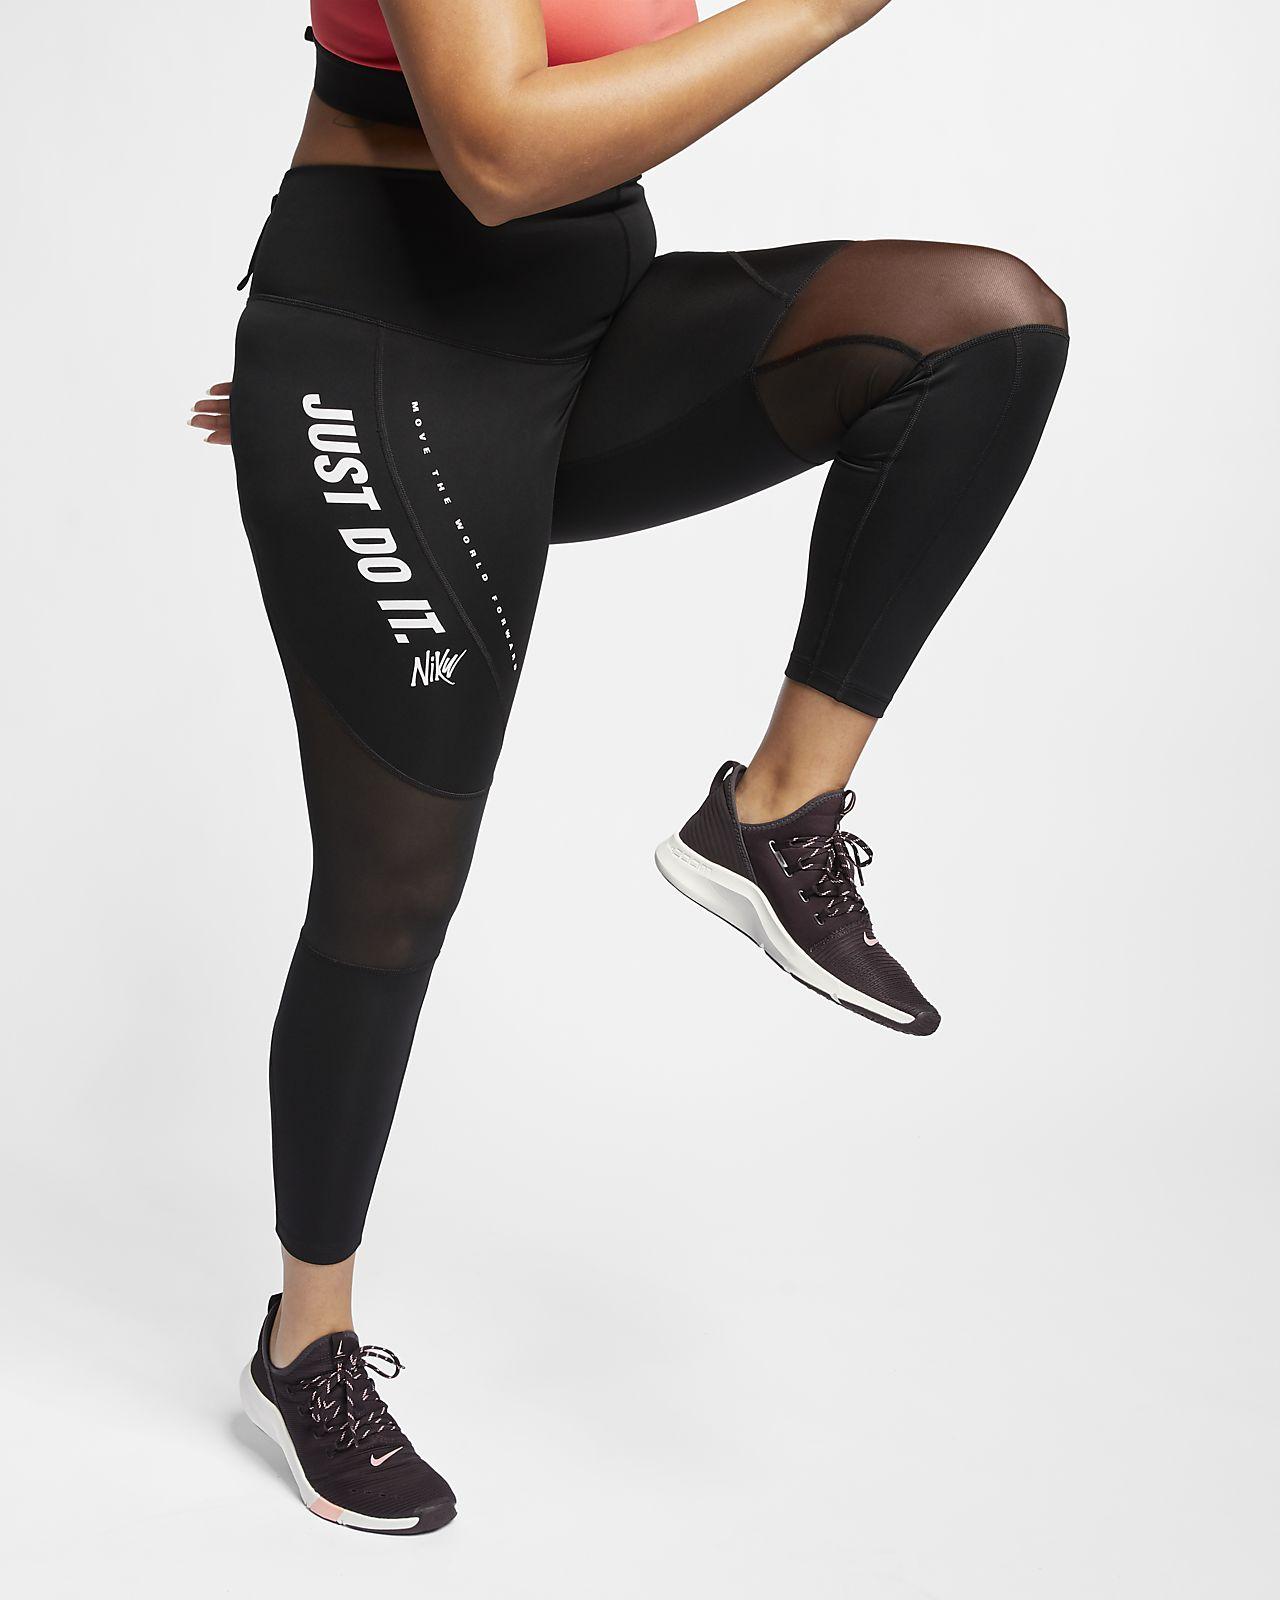 De Nike Taille Ca grande Femme Training Tight Power Pour zOwvpOZx